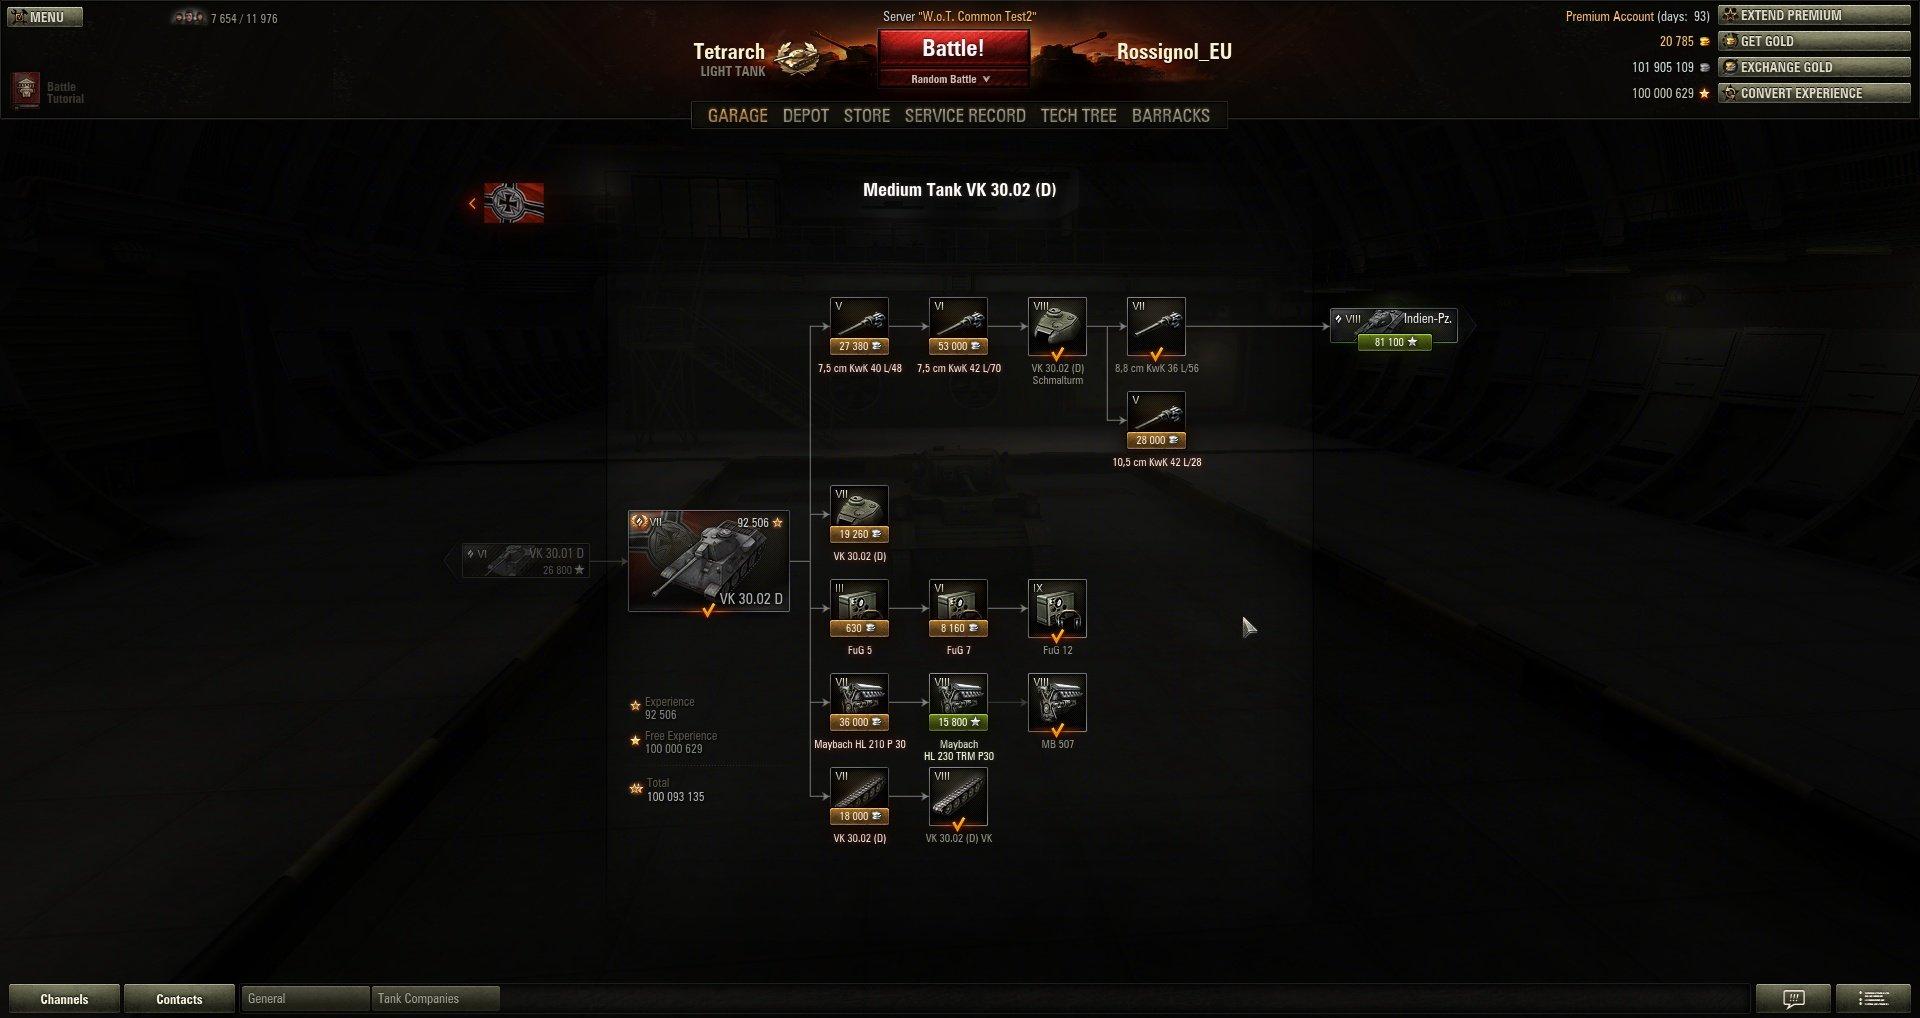 World of Tanks  12a28cf4-0c93-4d7a-8891-34eaee4eabca